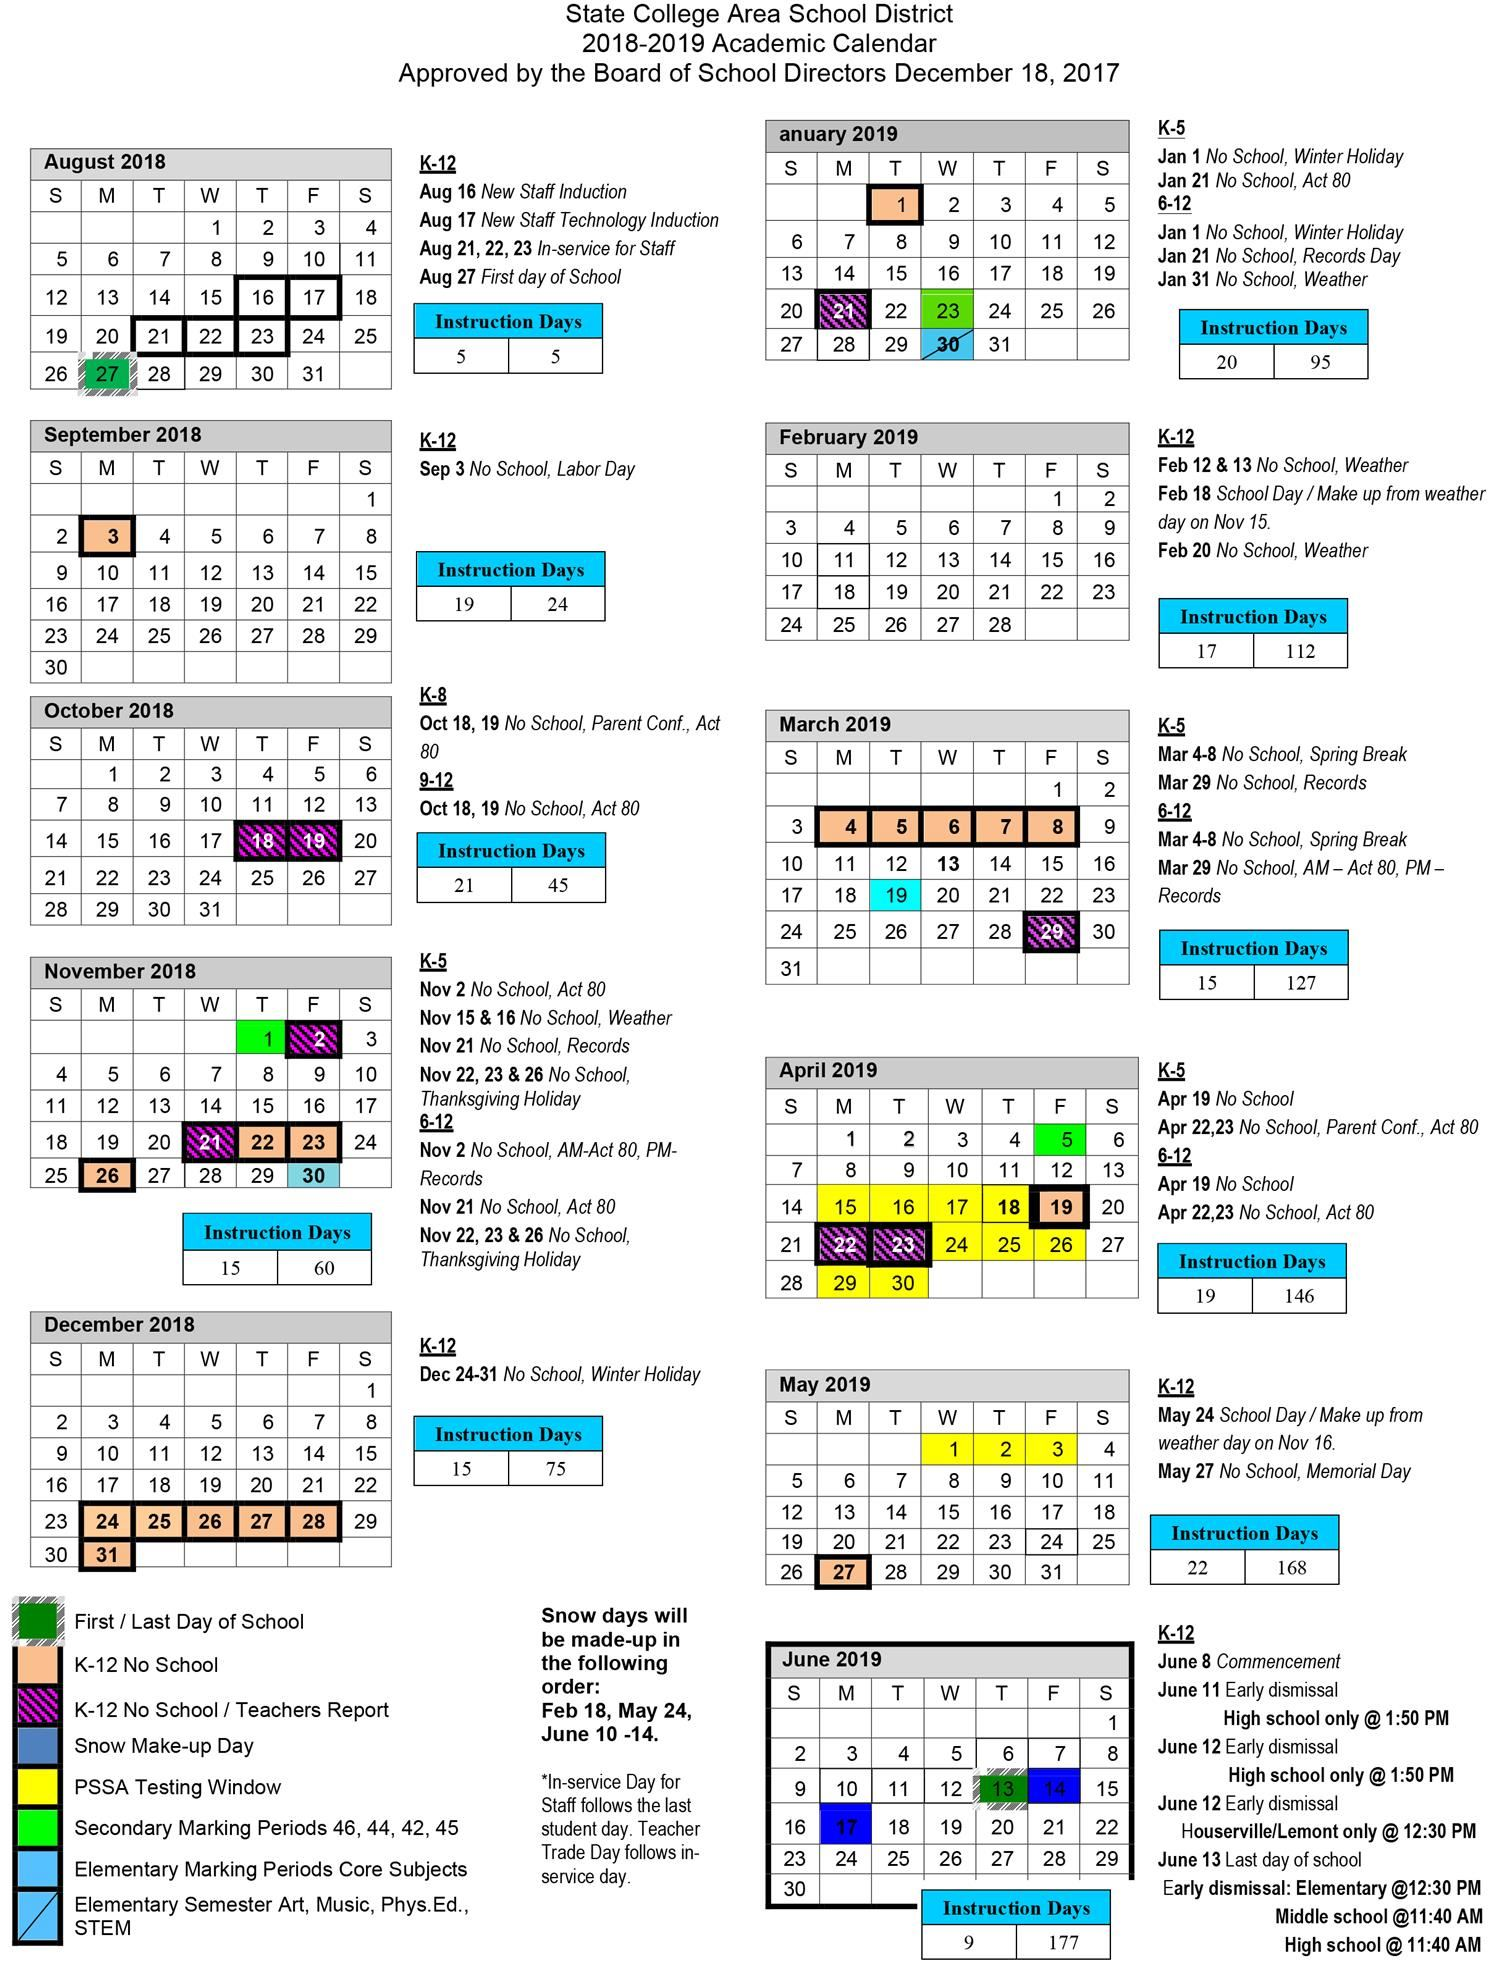 Penn State Academic Calendar 2019 2018 2019 Academic Calendar